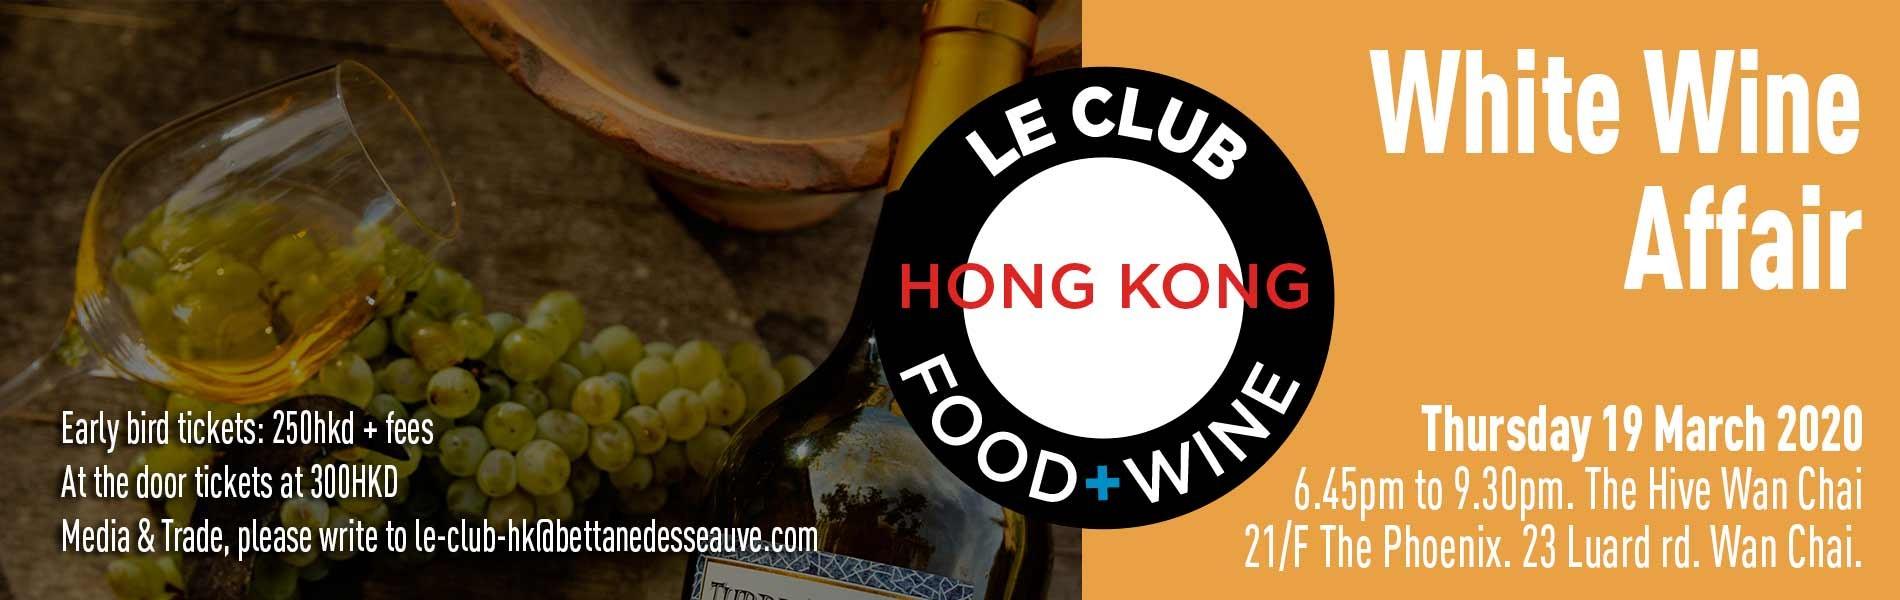 Le Club Food & Wine - White Wine Affair